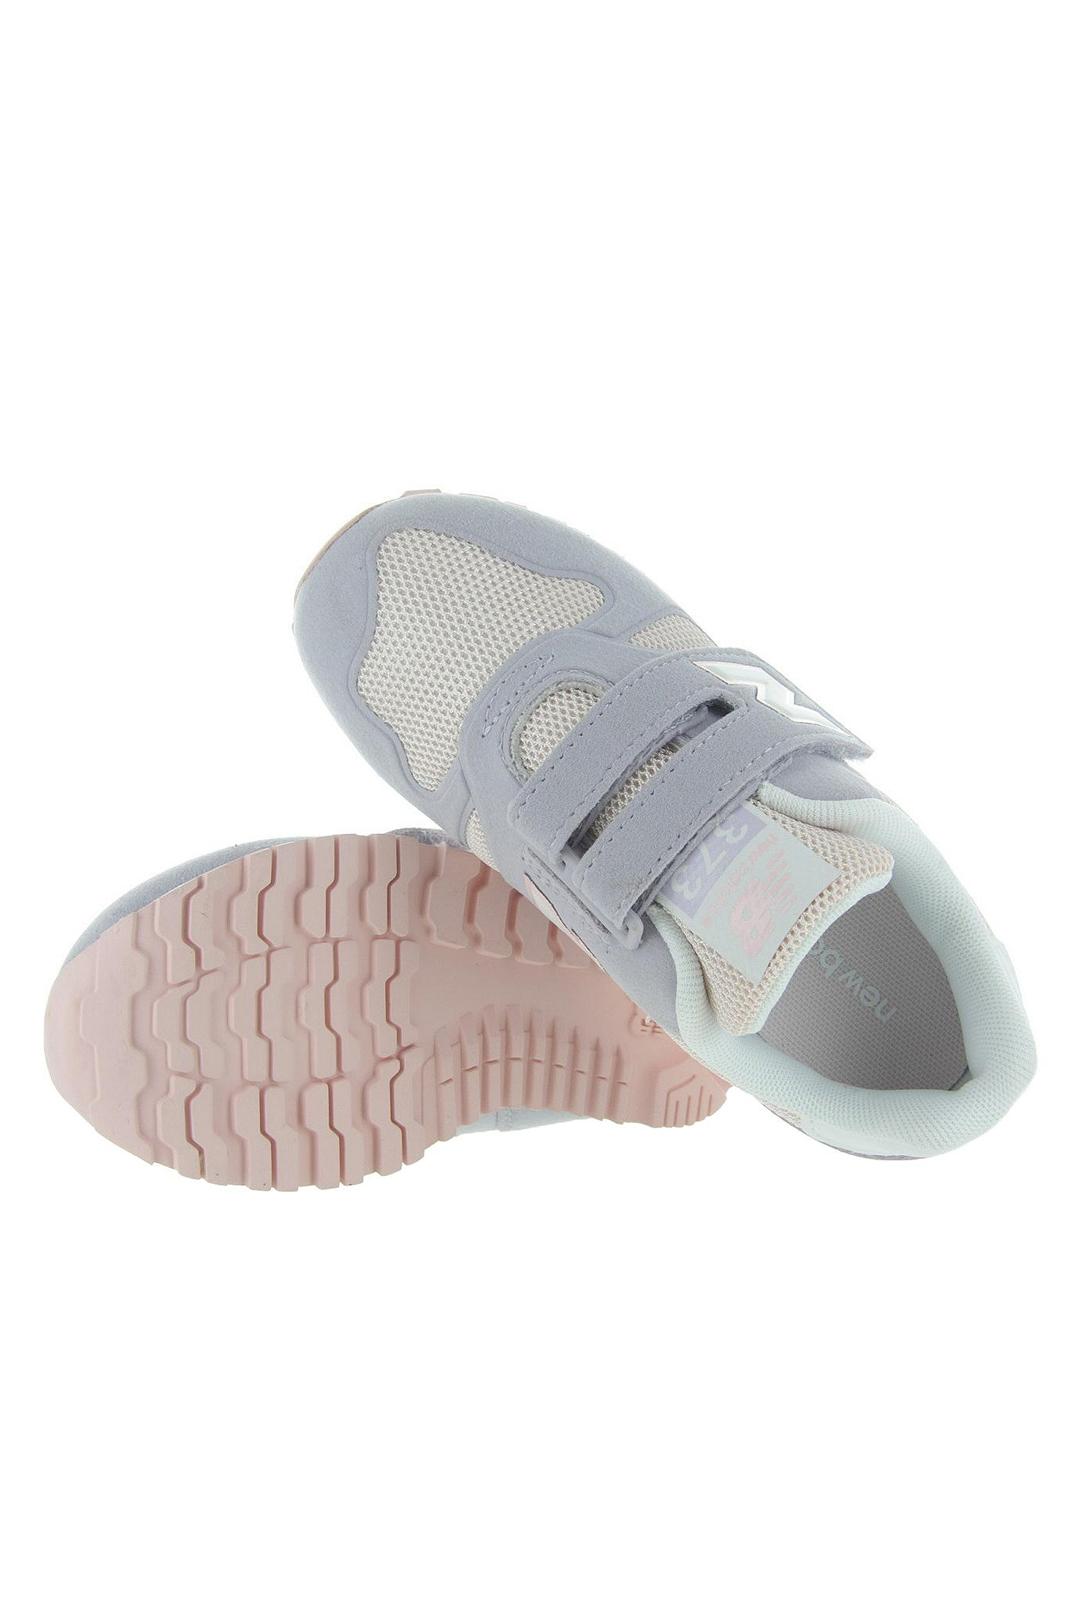 Baskets / Sneakers  New balance KA373P1Y parme